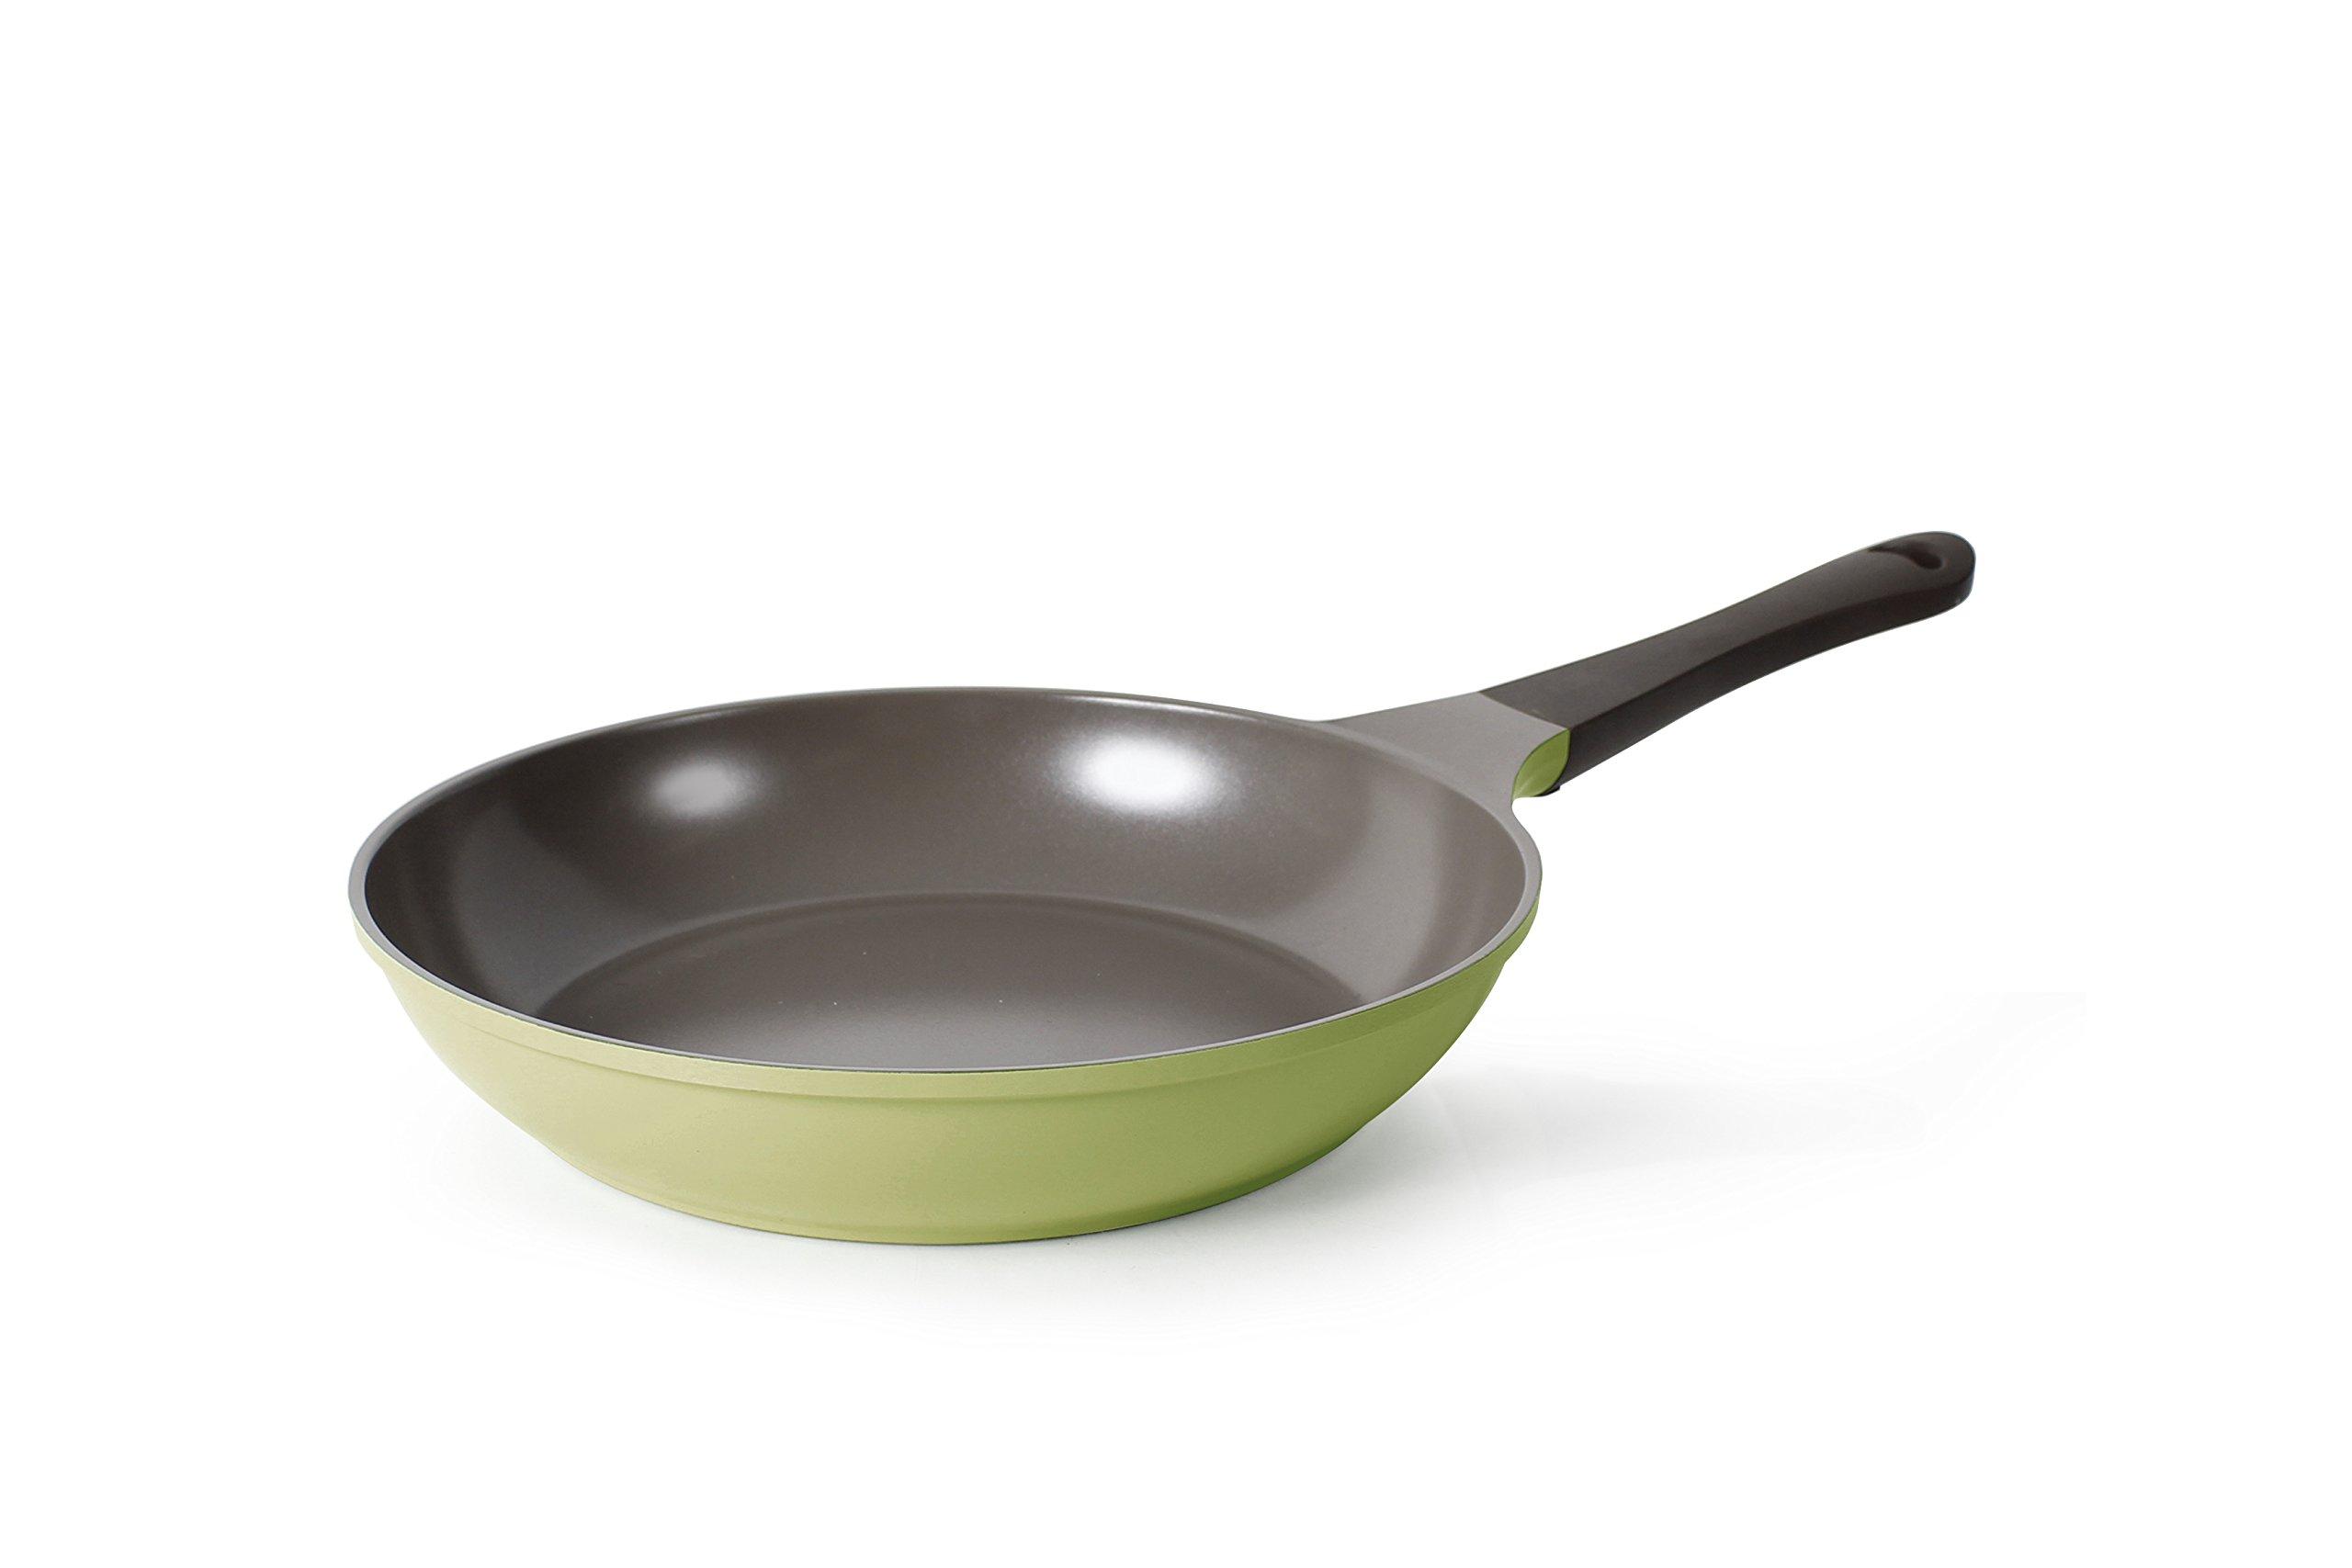 Neoflam Eela 10-Inch Frying Pan with Bakelite Handle and Ecolon Non-Stick Coating by Neoflam